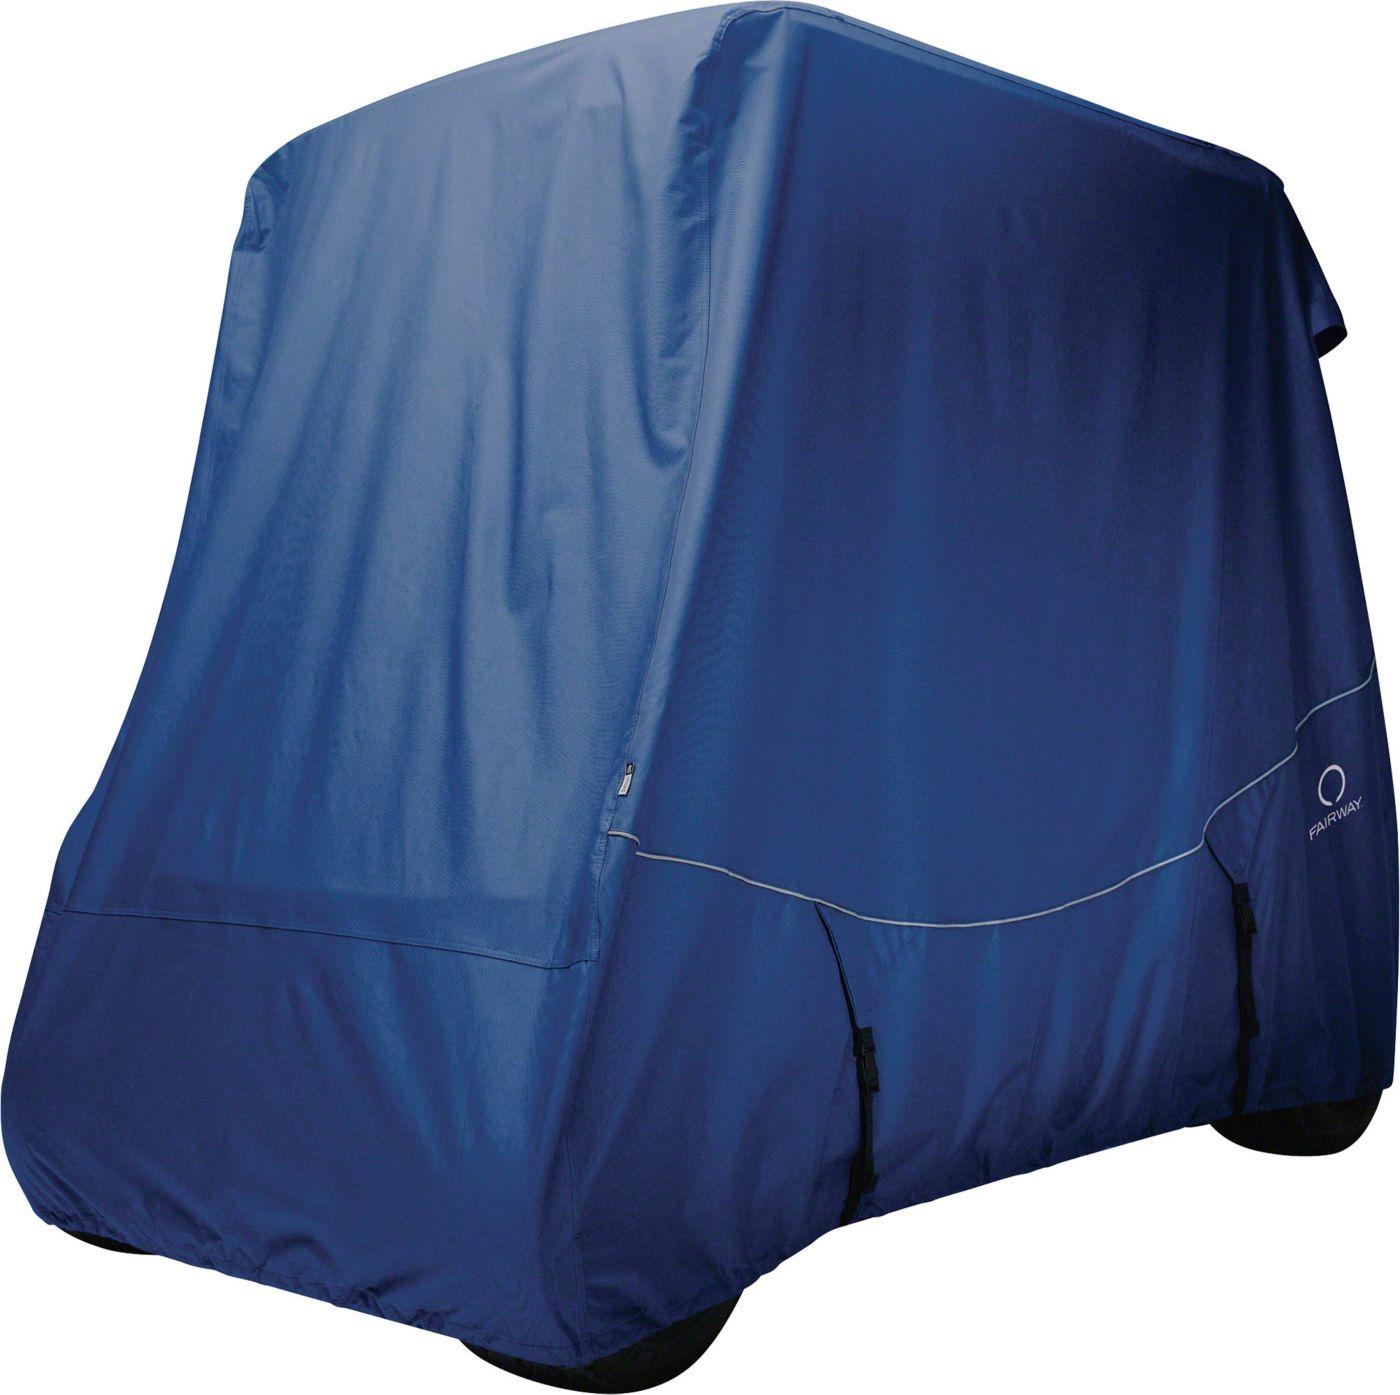 Classic Accessories Fairway FadeSafe Quick-Fit Golf Cart Cover